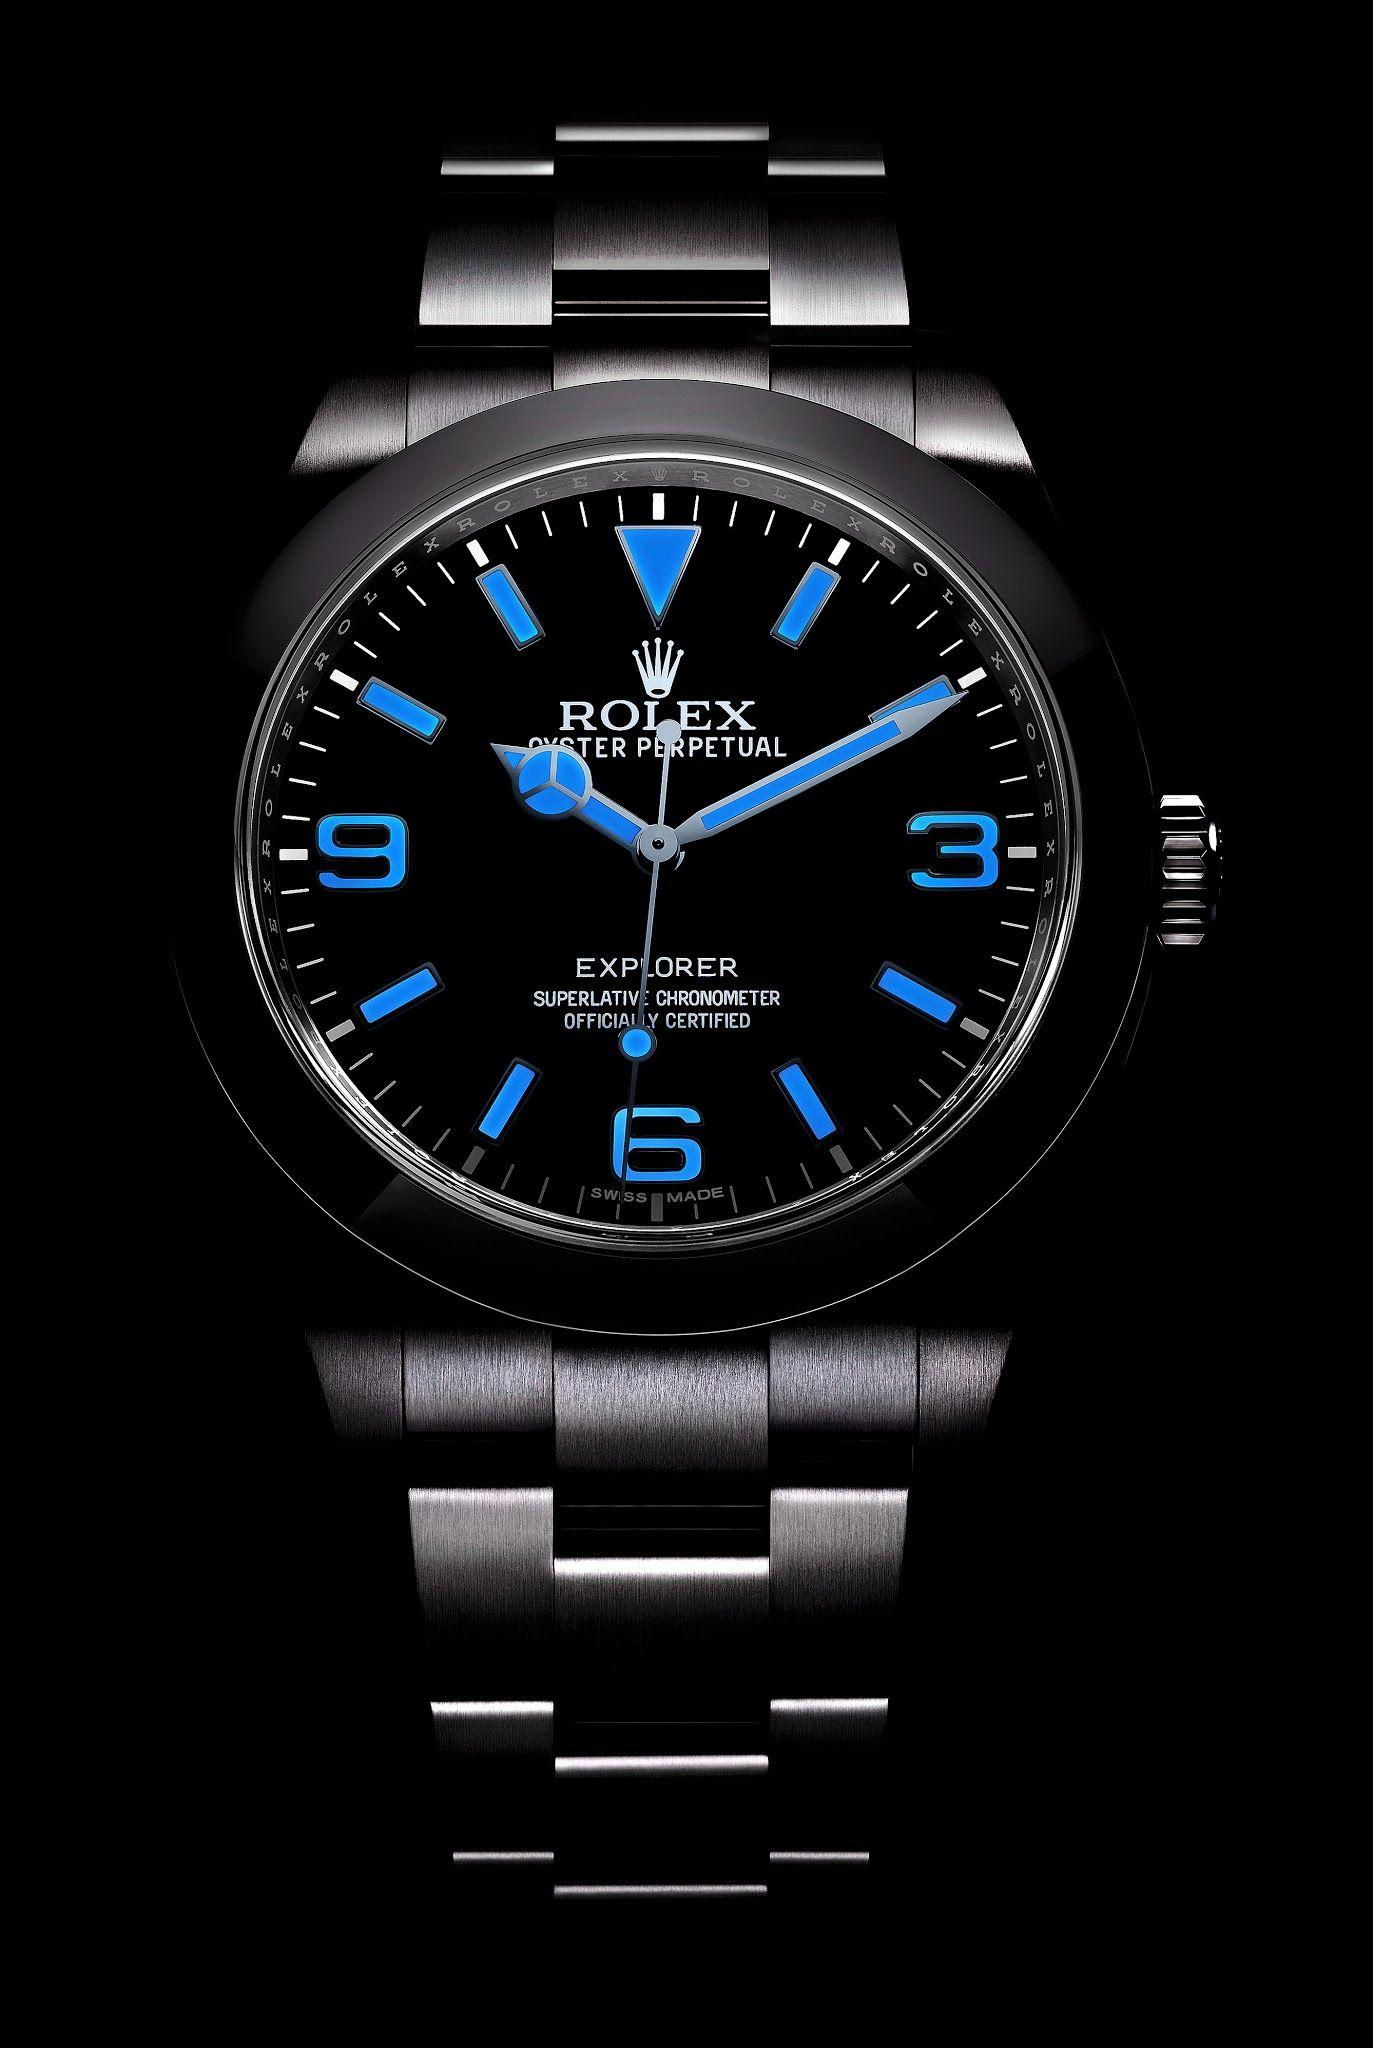 214270 new explorer lume Google Search Rolex watches